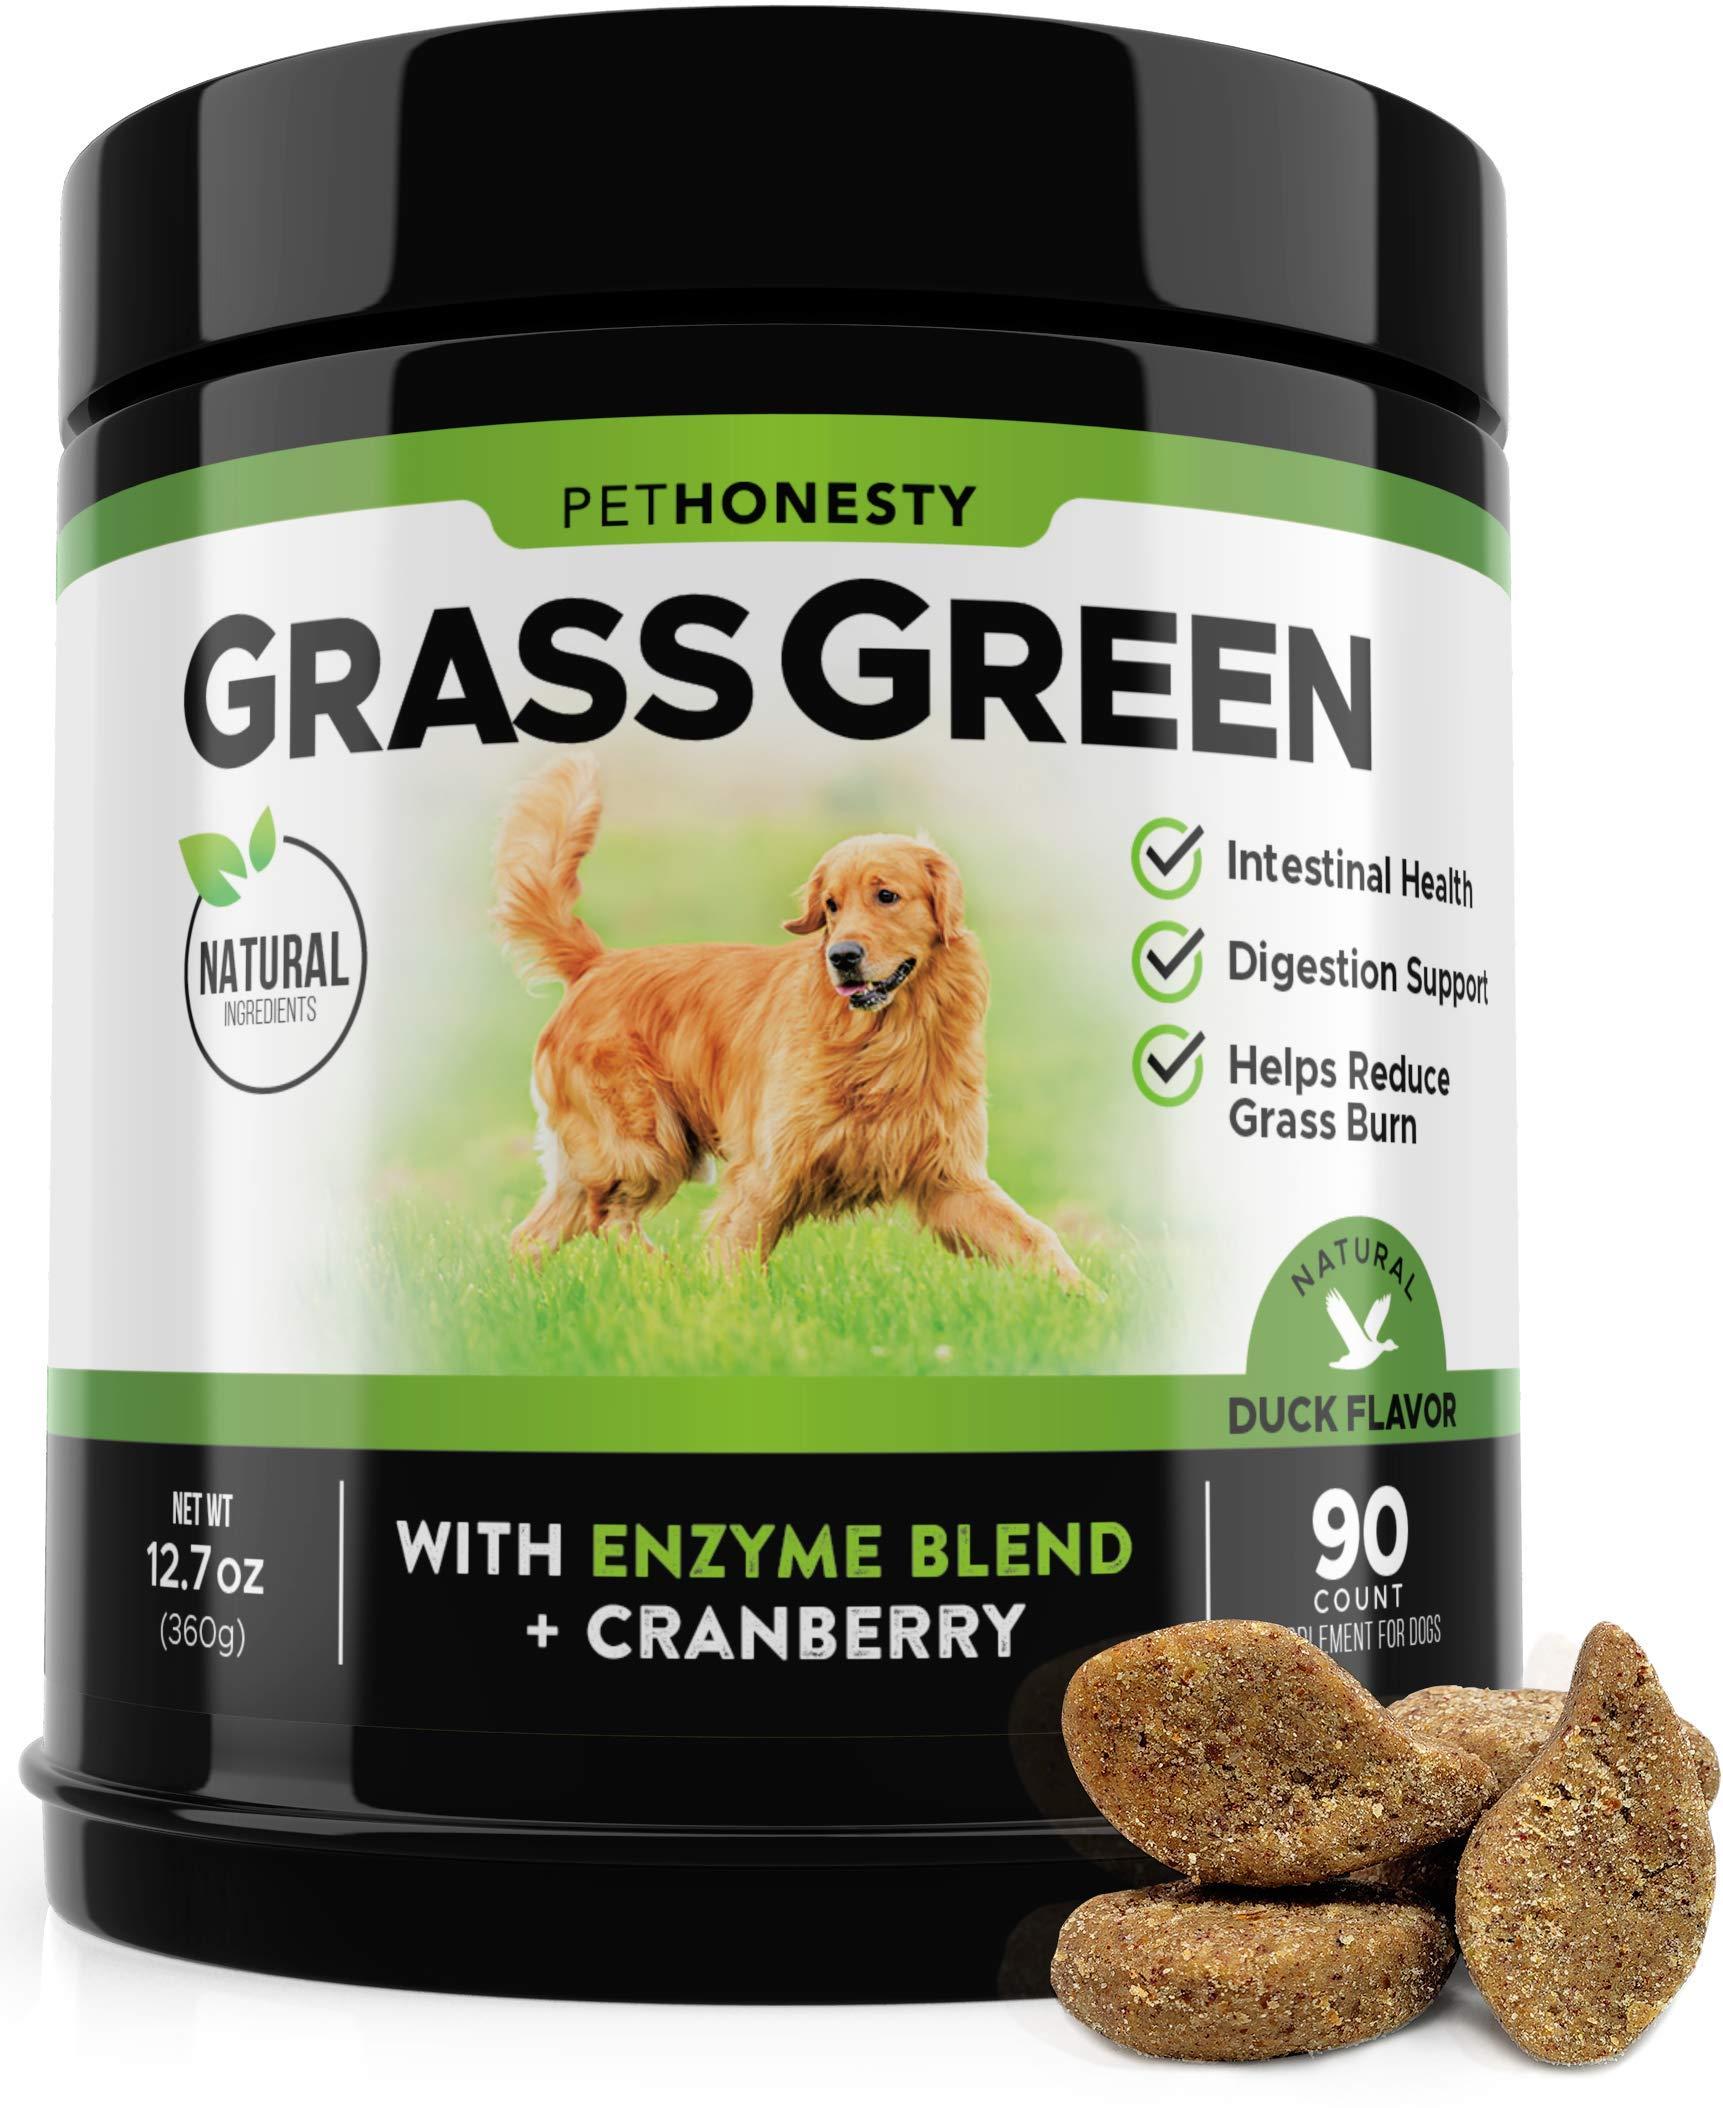 PetHonesty GrassGreen Grass Burn Spot Chews for Dogs - Dog Pee Lawn Spot Saver Treatment Caused by Dog Urine - Cranberry, Apple Cider Vinegar, DL-Methionine Grass Treatment Rocks - 90 Chew Treats by PetHonesty